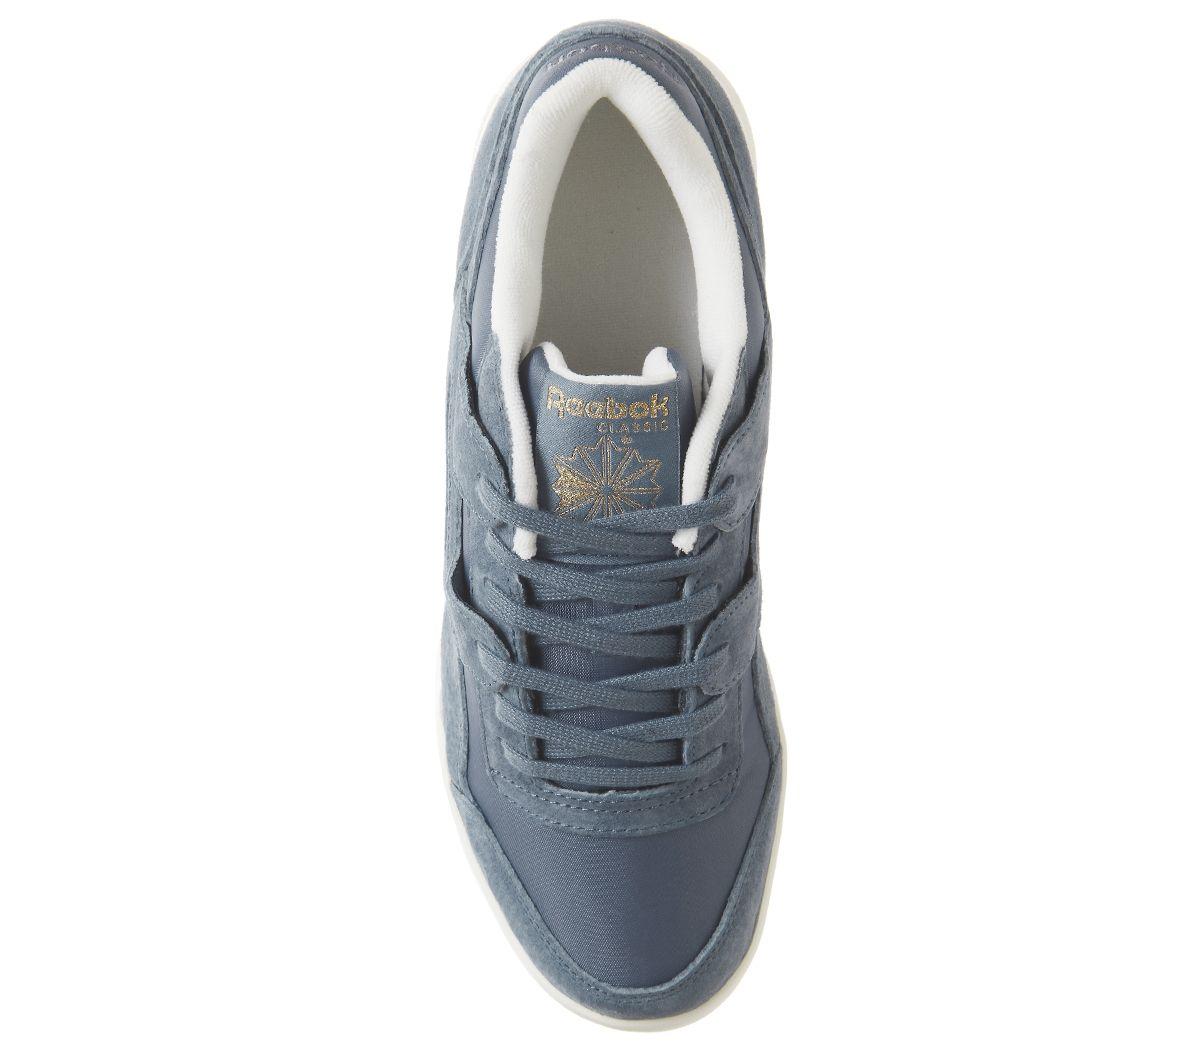 7a4fe5243a4 Womens Reebok Workout Lo Plus Trainers Blue Slate Chalk Brass ...